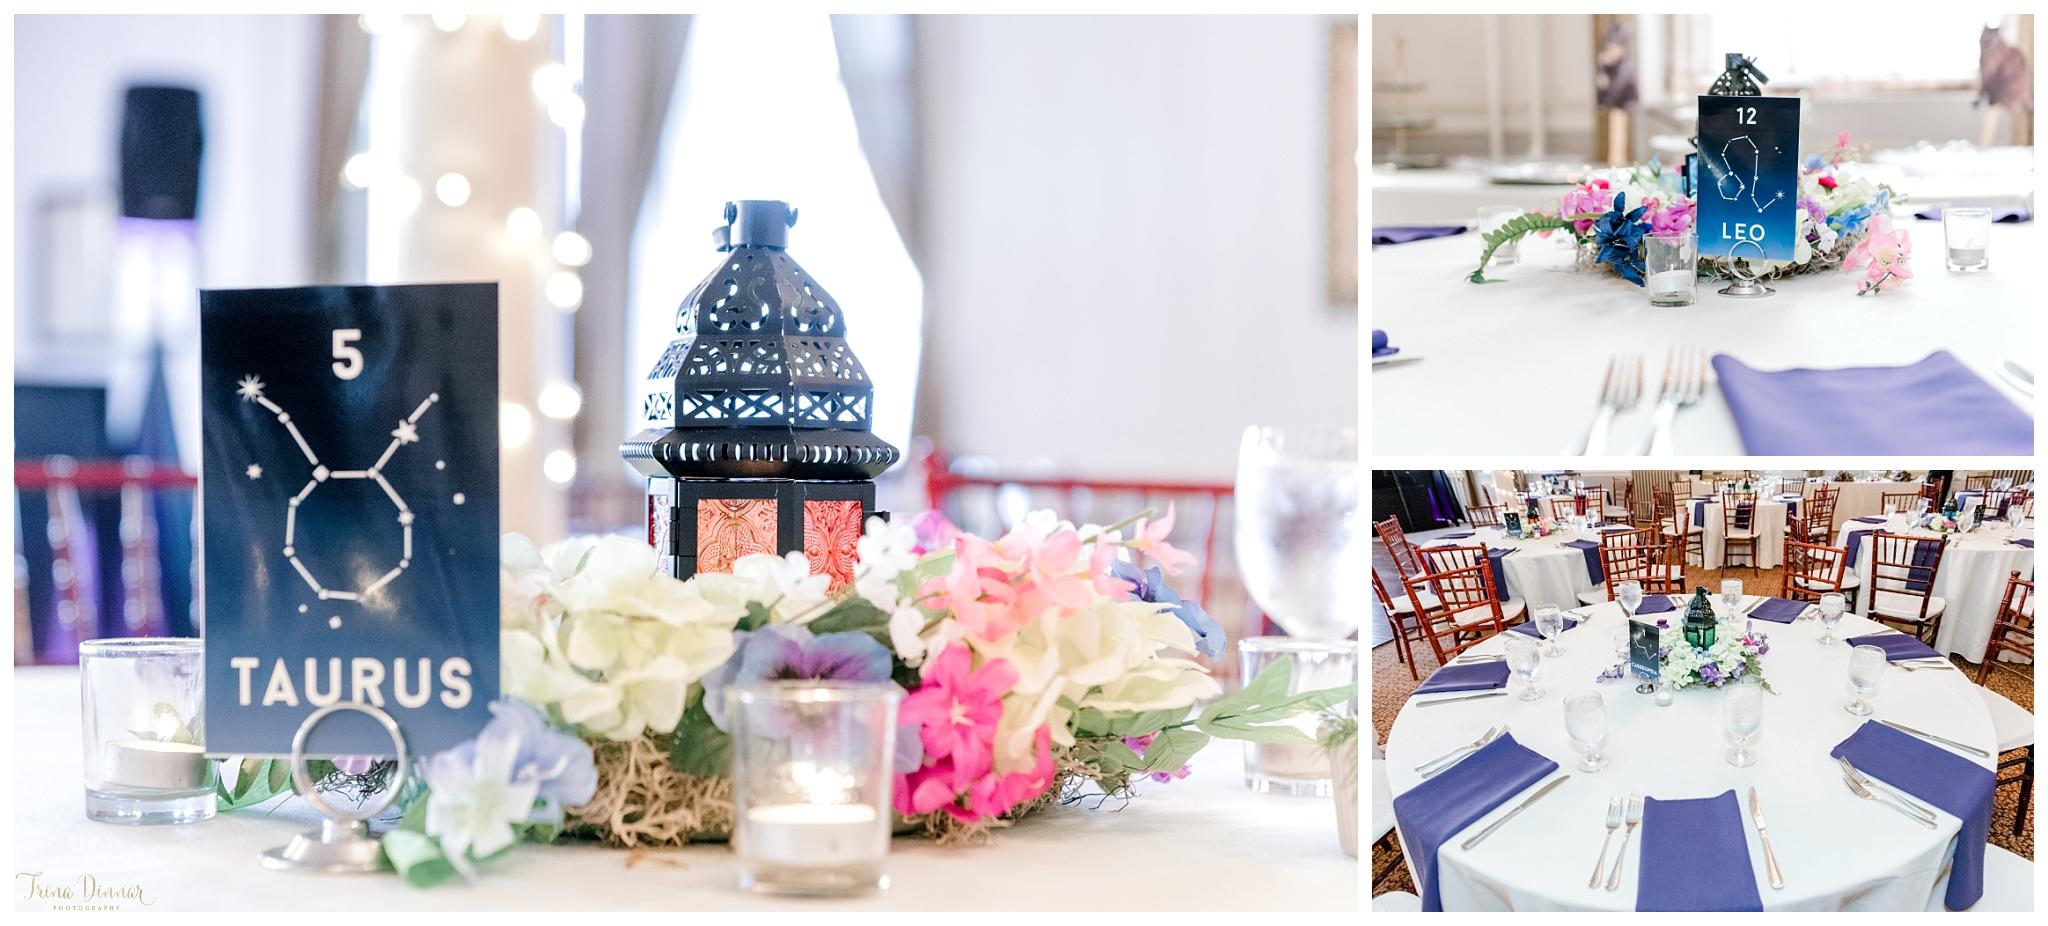 Astrology Constellation Star DIY Wedding Reception Decor